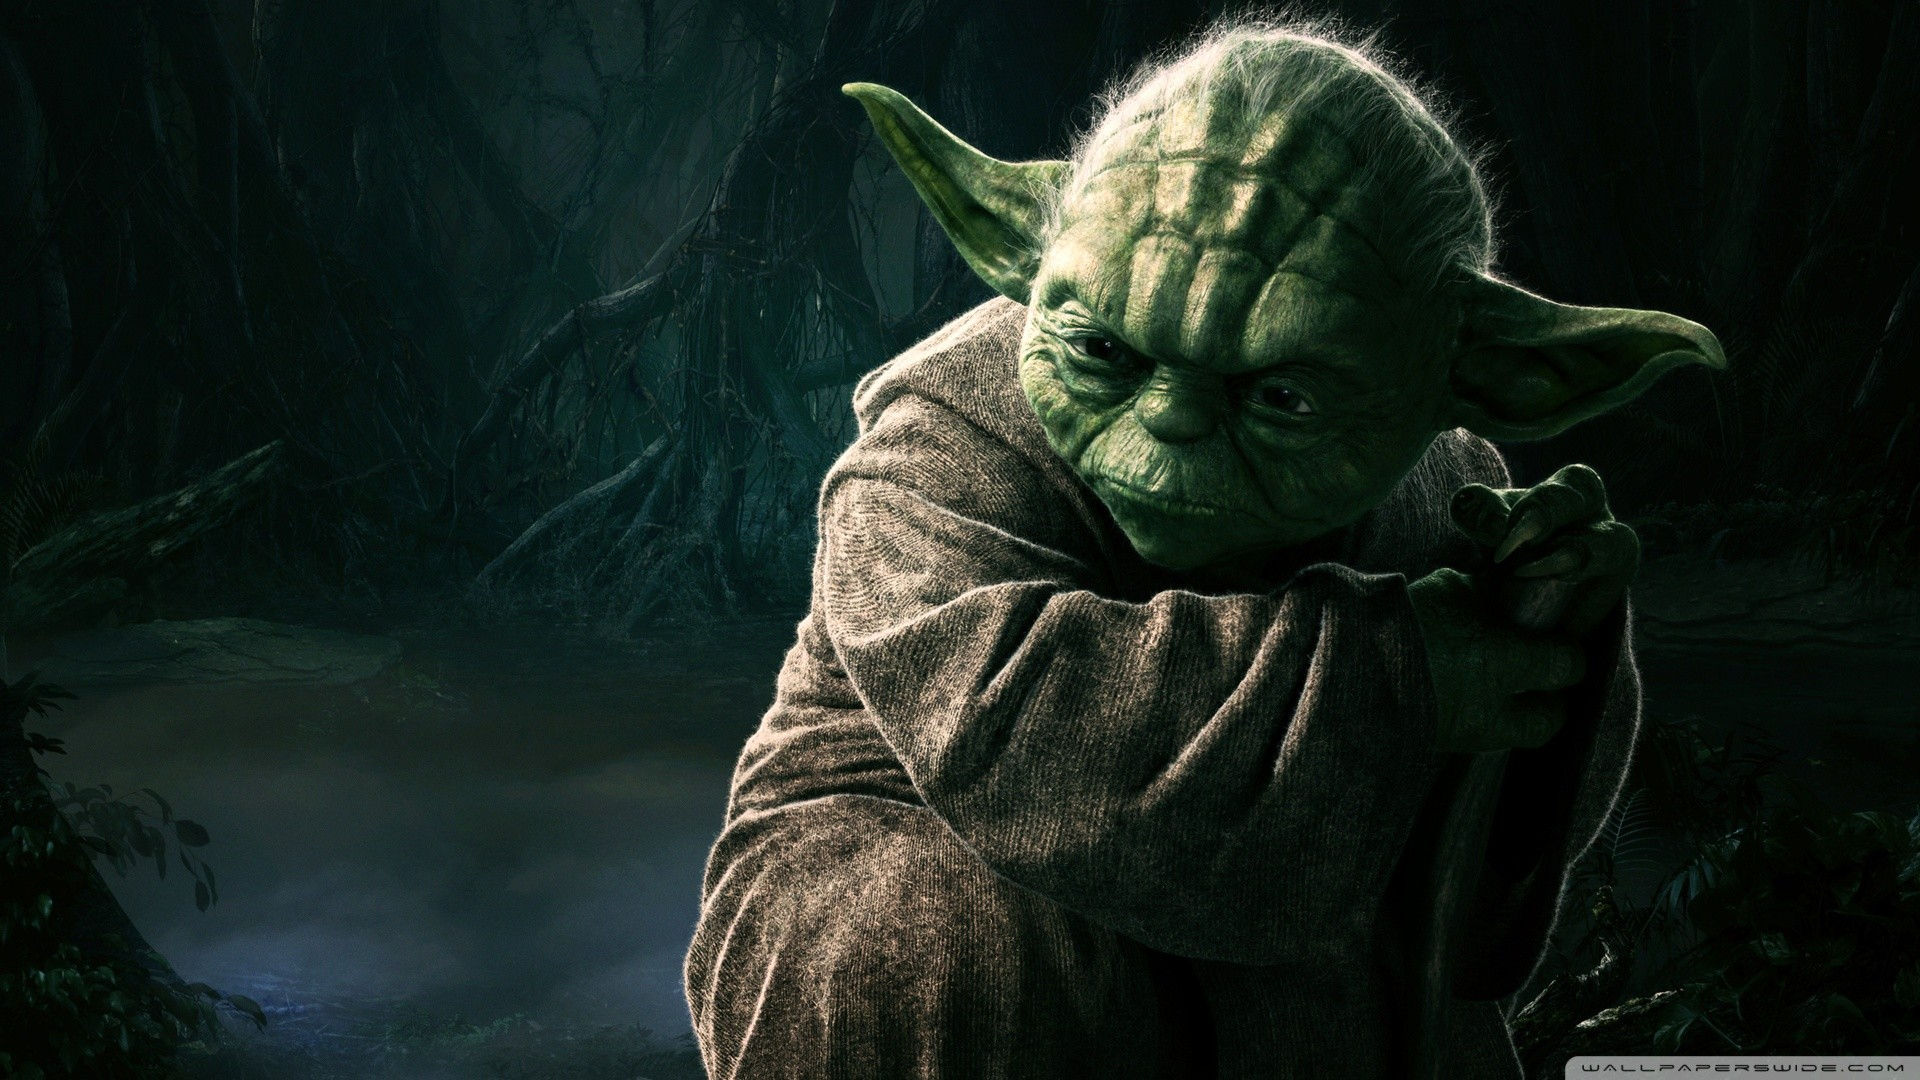 Hoy les traigo Star Wars Wallpapers en 1080p!